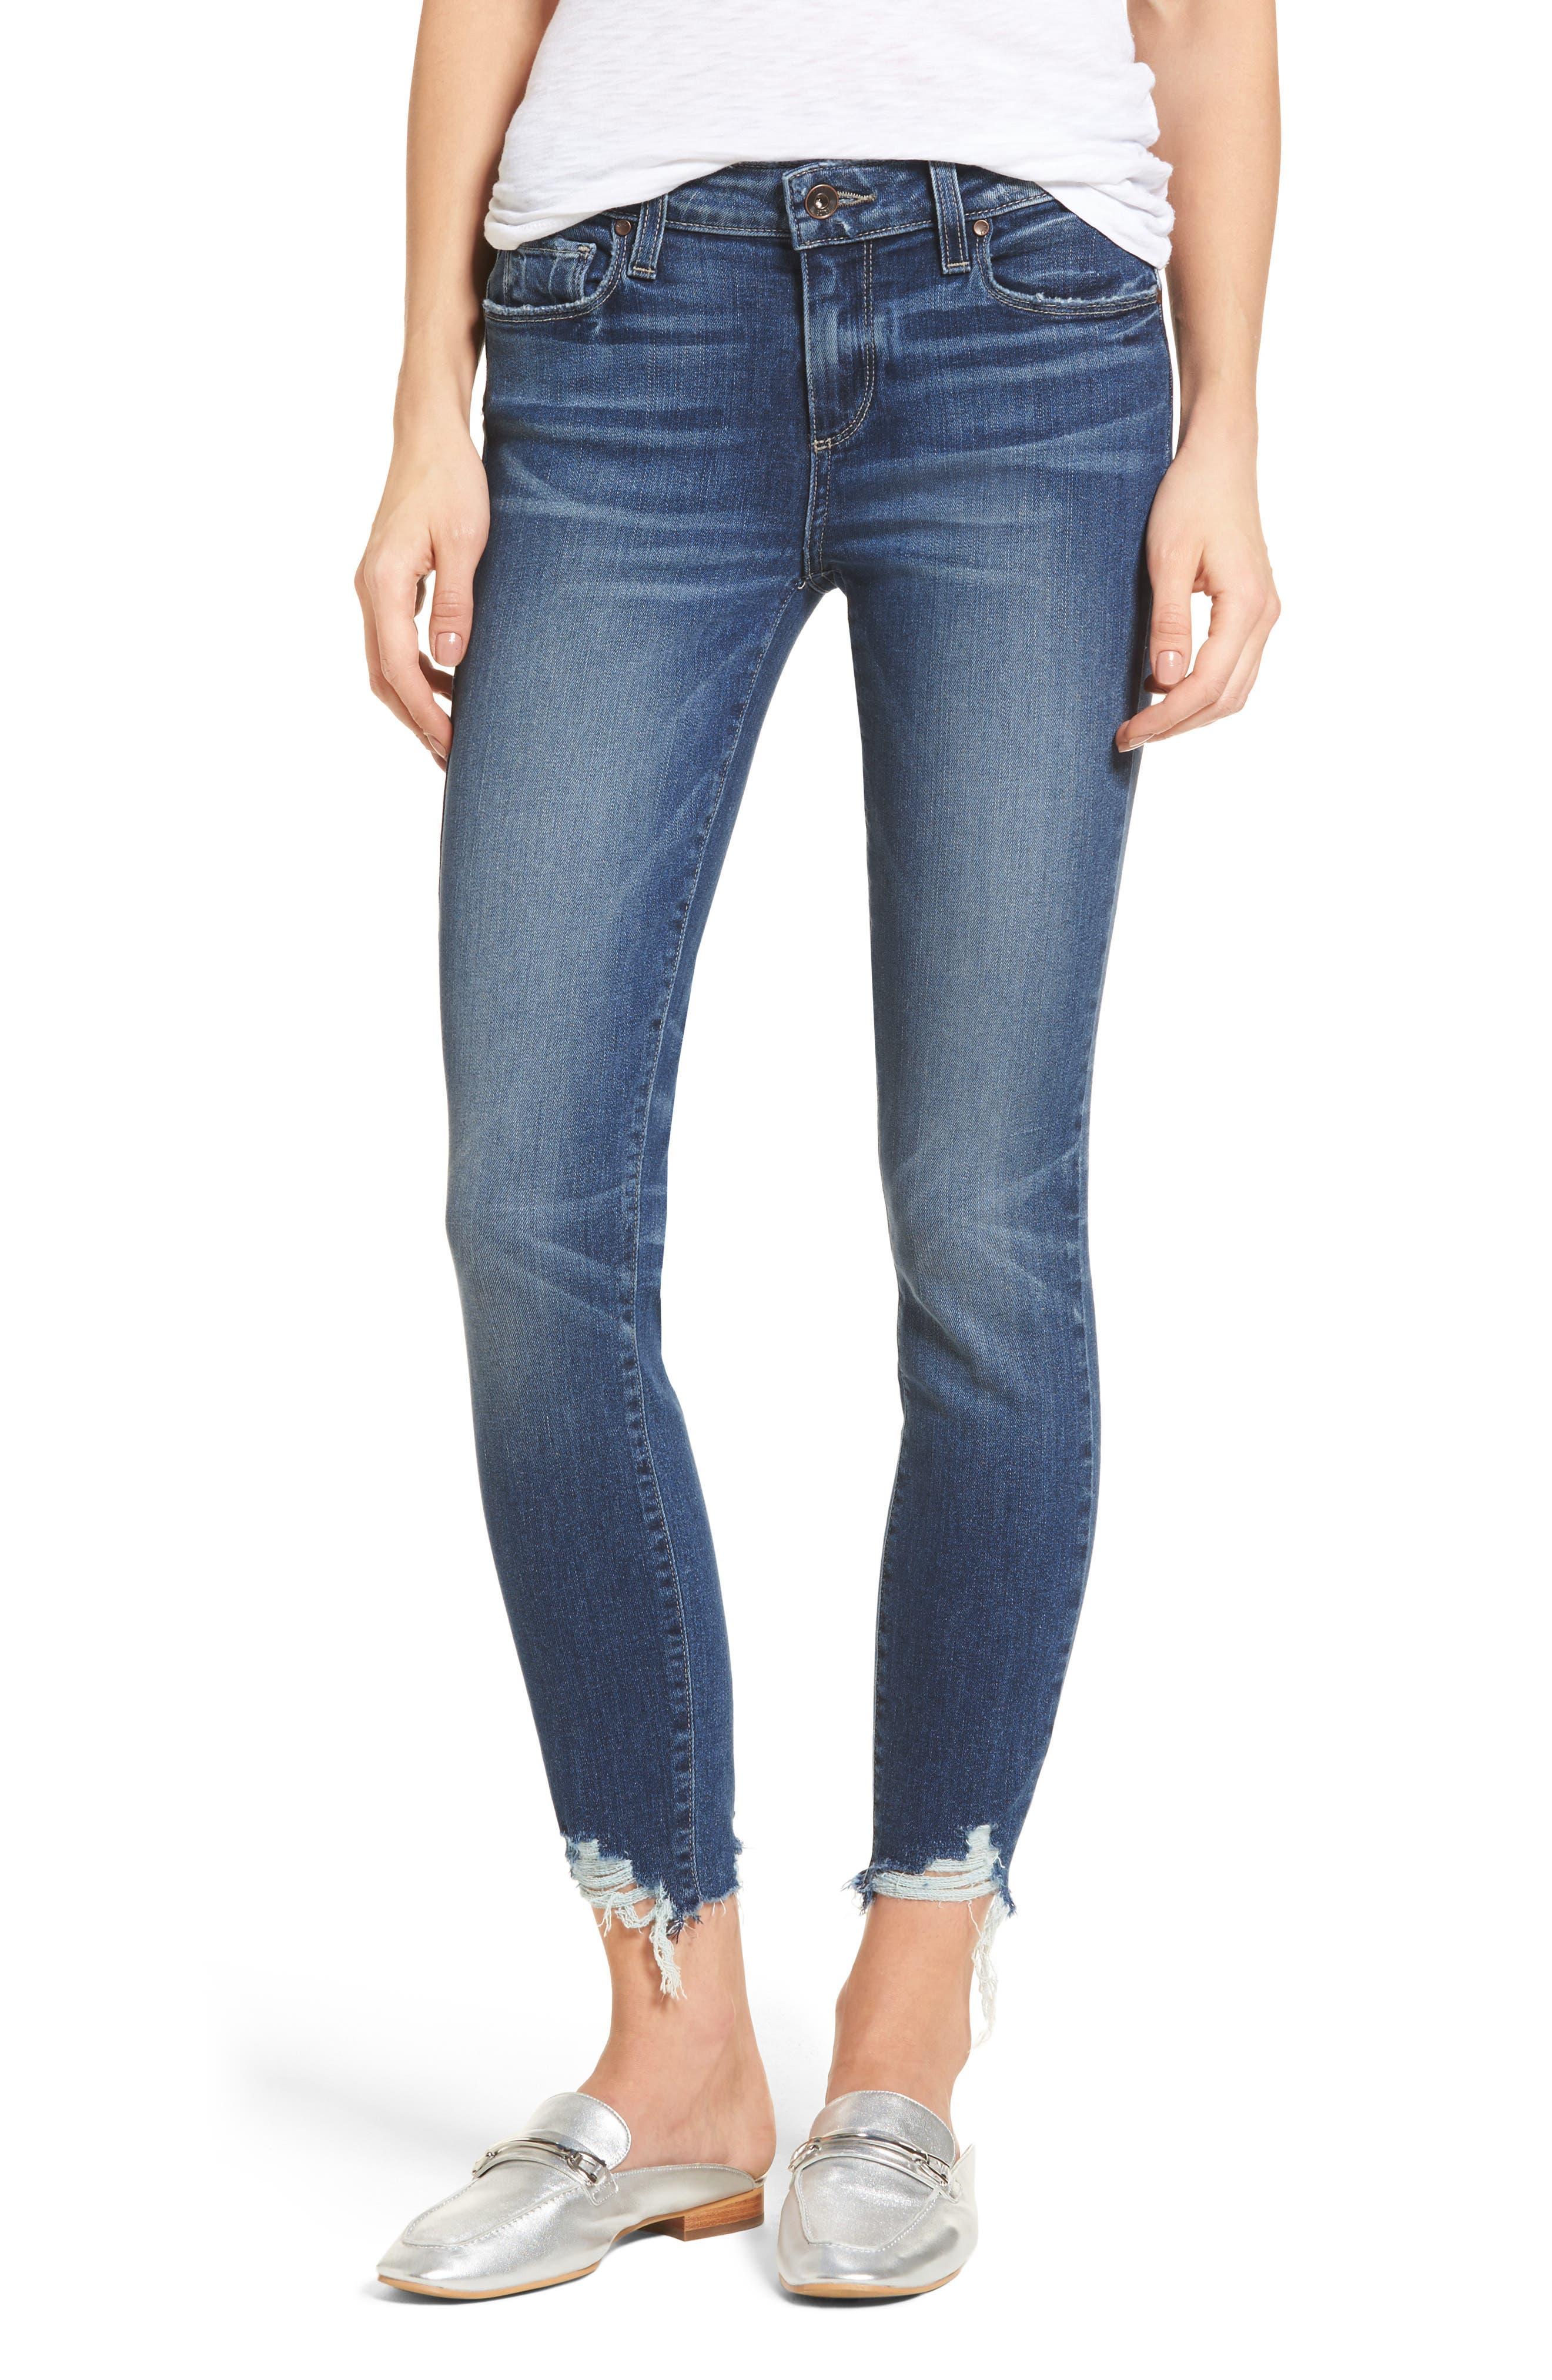 Main Image - PAIGE Transcend Vintage - Verdugo Ankle Skinny Jeans (Malibu Super Distressed) (Petite)